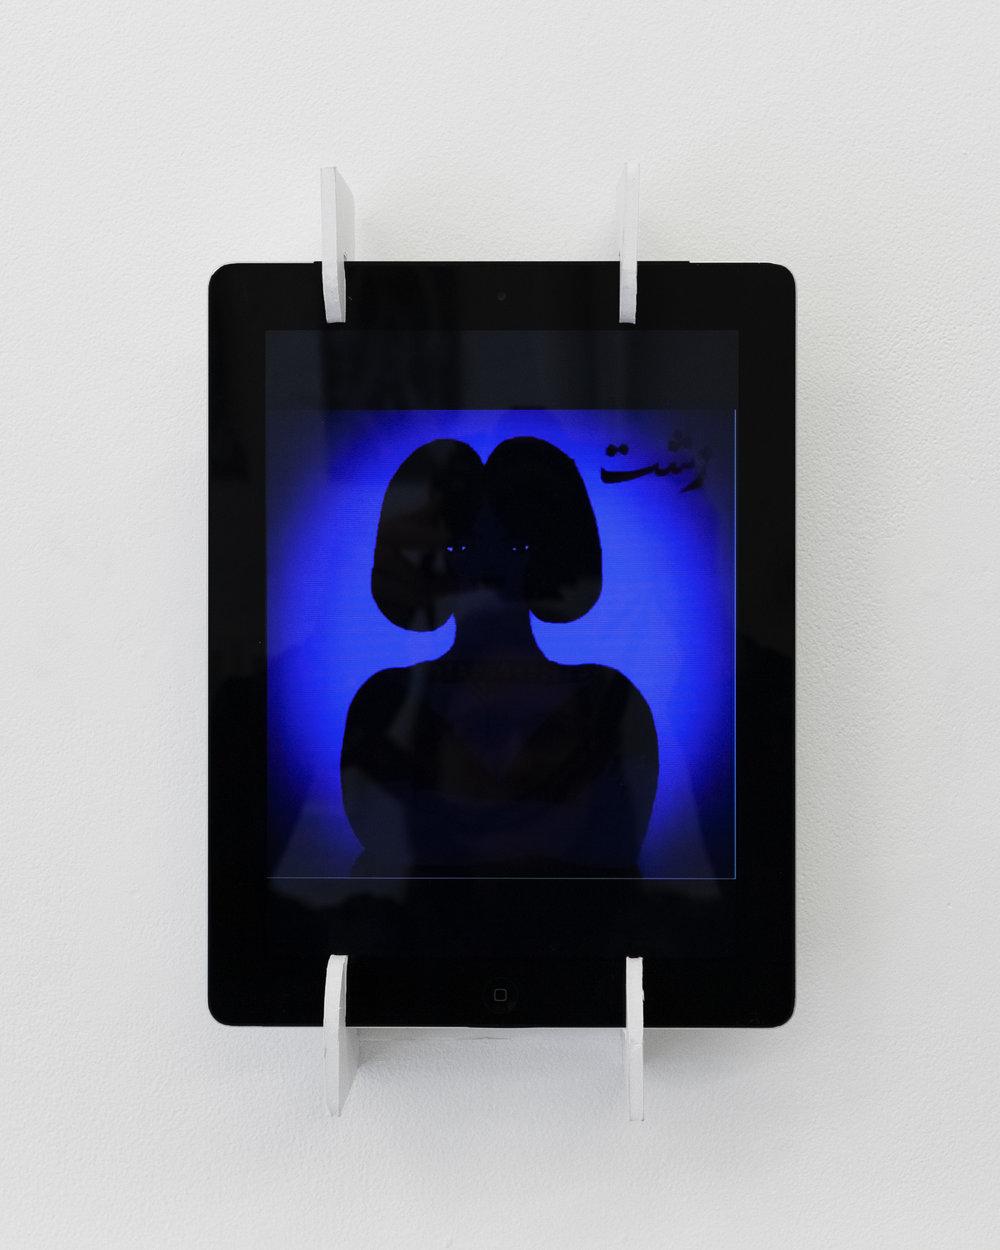 Atieh Sohrabi, 10 Minute, Animation , 2019